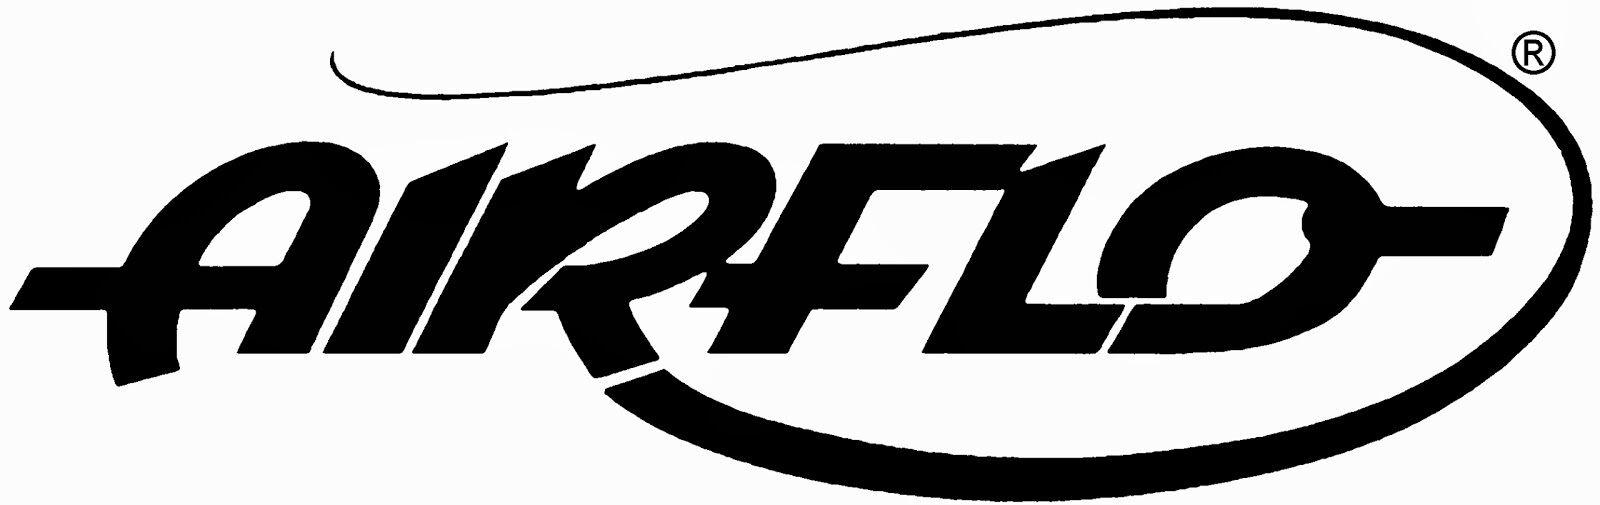 AIRFLO ELITE TROUT WF-6-F  6 6  WT LICHEN Grün WEIGHT FORWARD FLOATING FLY LINE 51aade